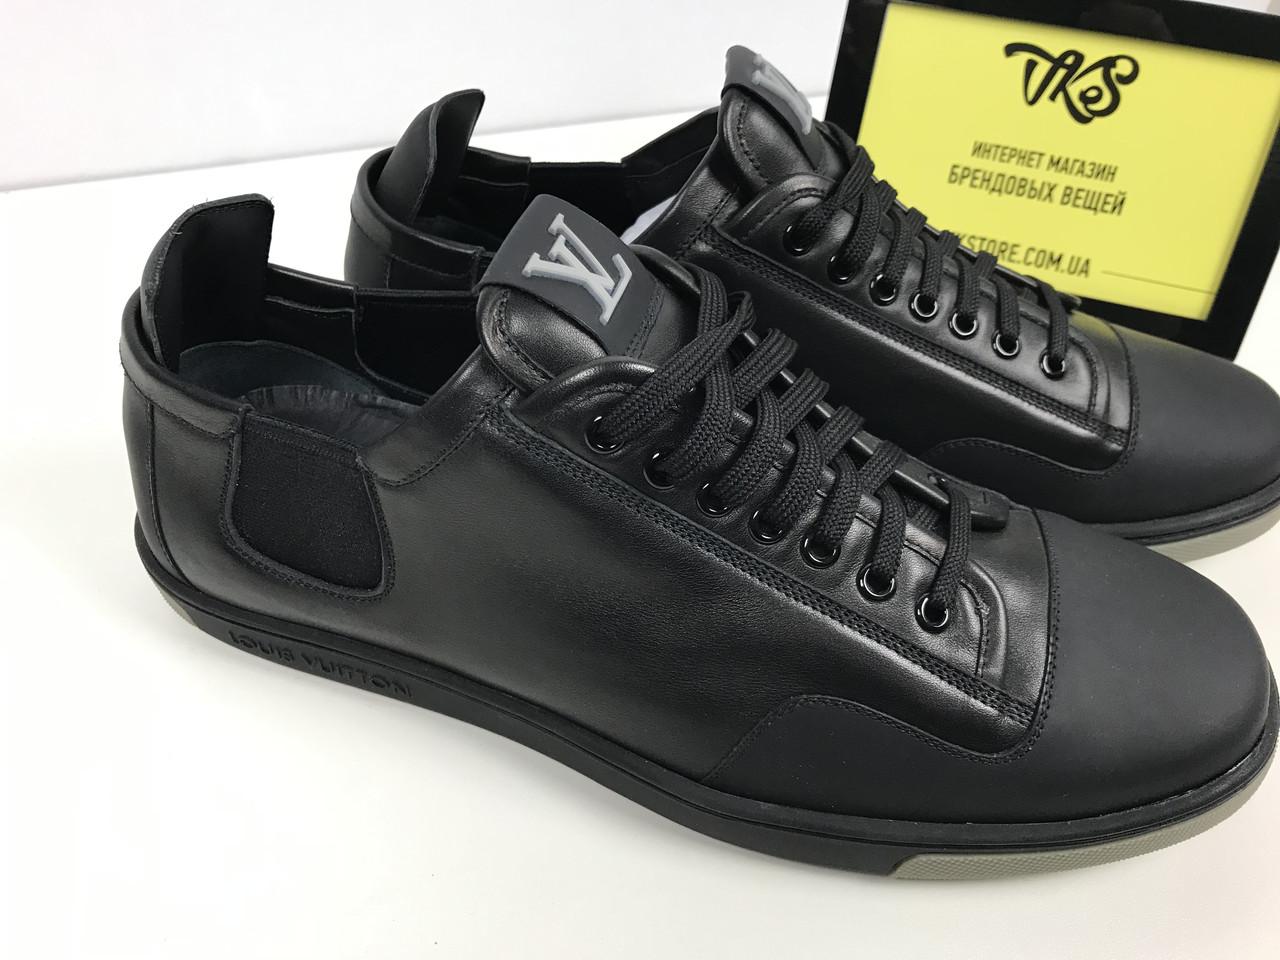 f446eaa280ac Мужская обувь Louis Vuitton - обувь louis vuitton реплика   vkstore ...